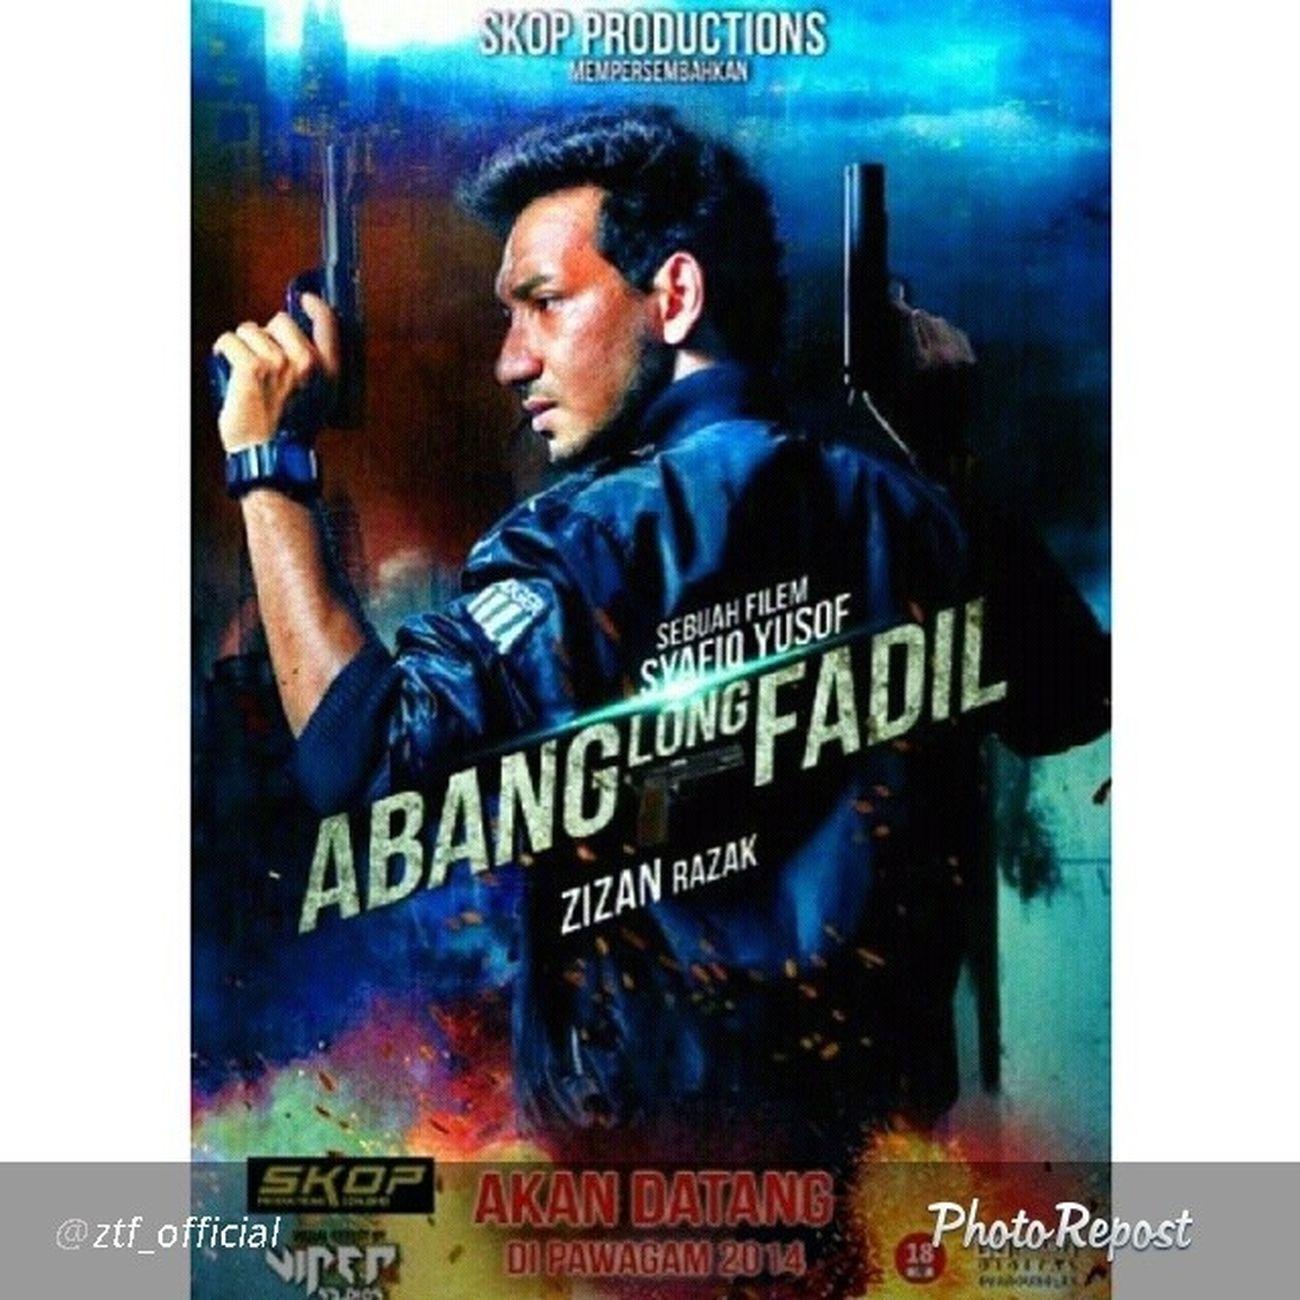 "By @ztf_official ""Coming soon. . AbangLongFadhil SkopProductions starring @zizanrazak869"" via @PhotoRepost_app"